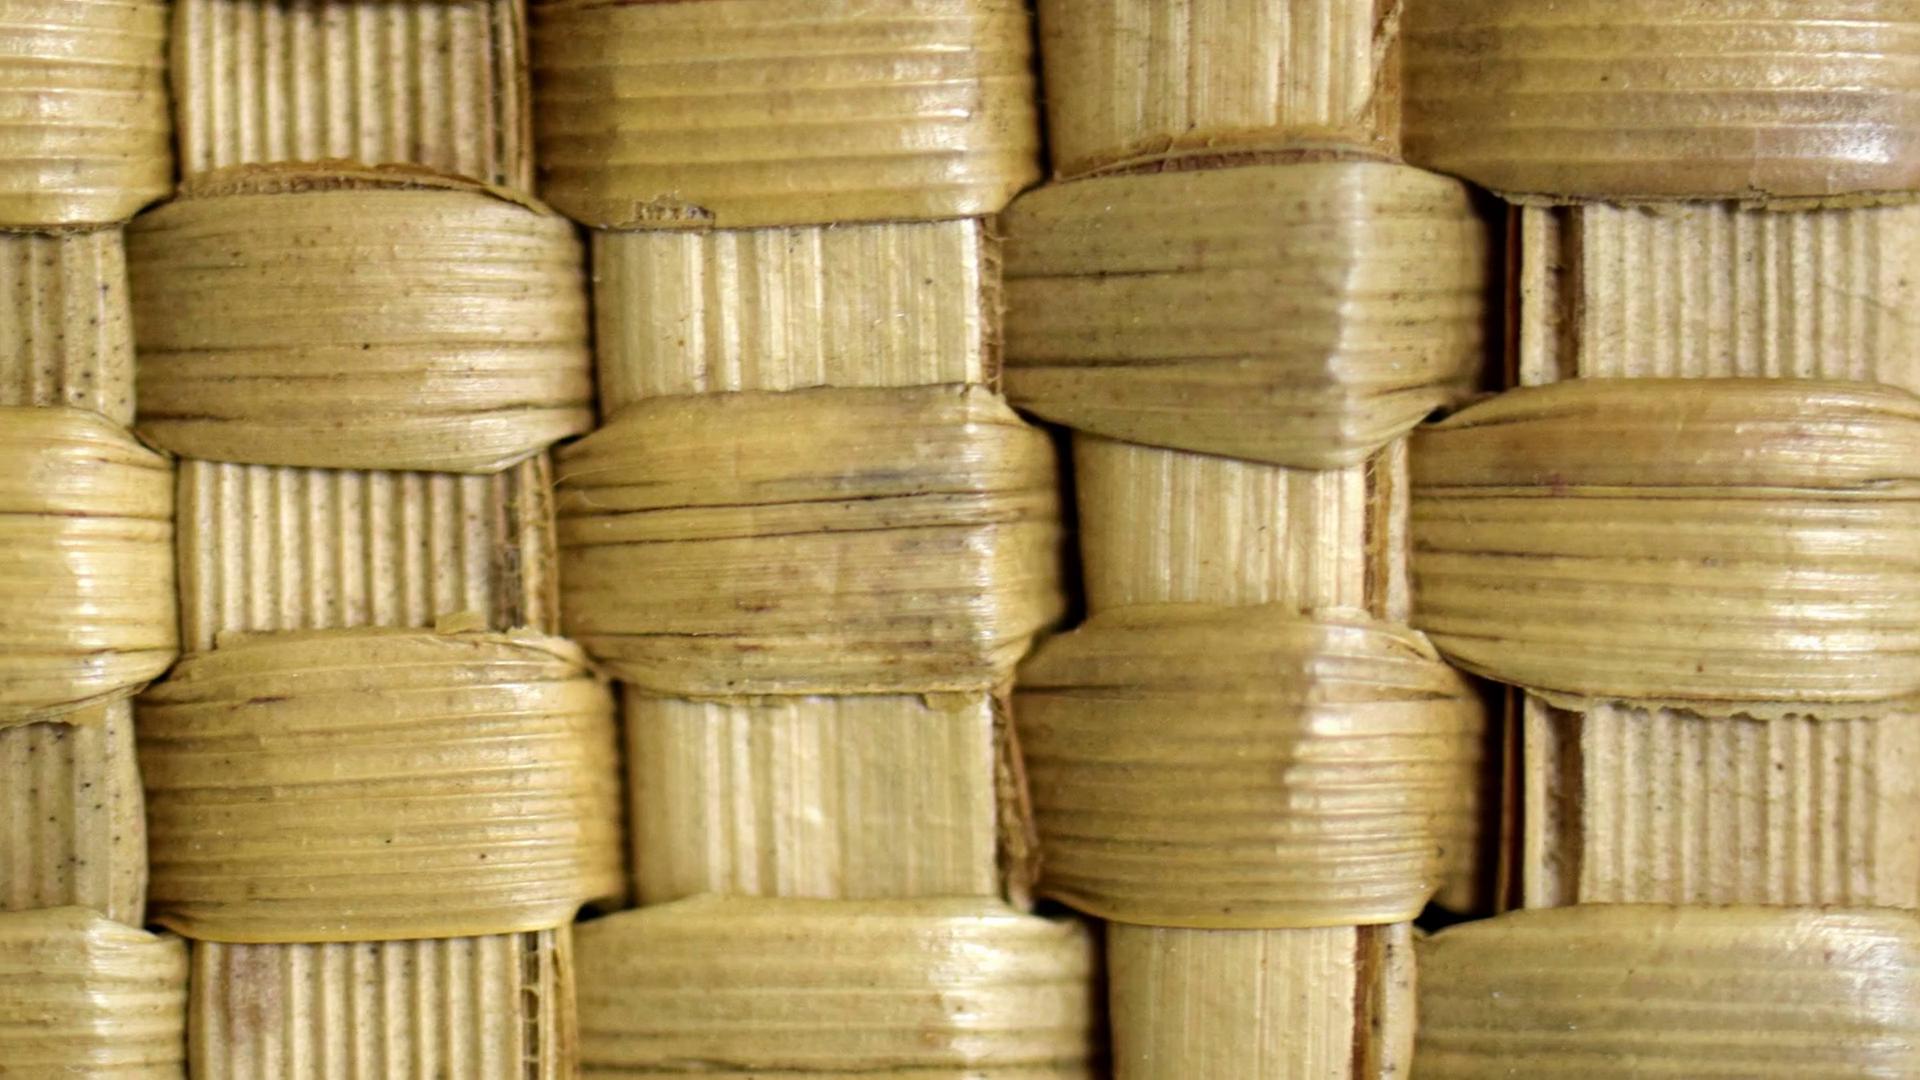 Basket Weave Close Up Texture 4K UHD Stock Video Footage - Videoblocks